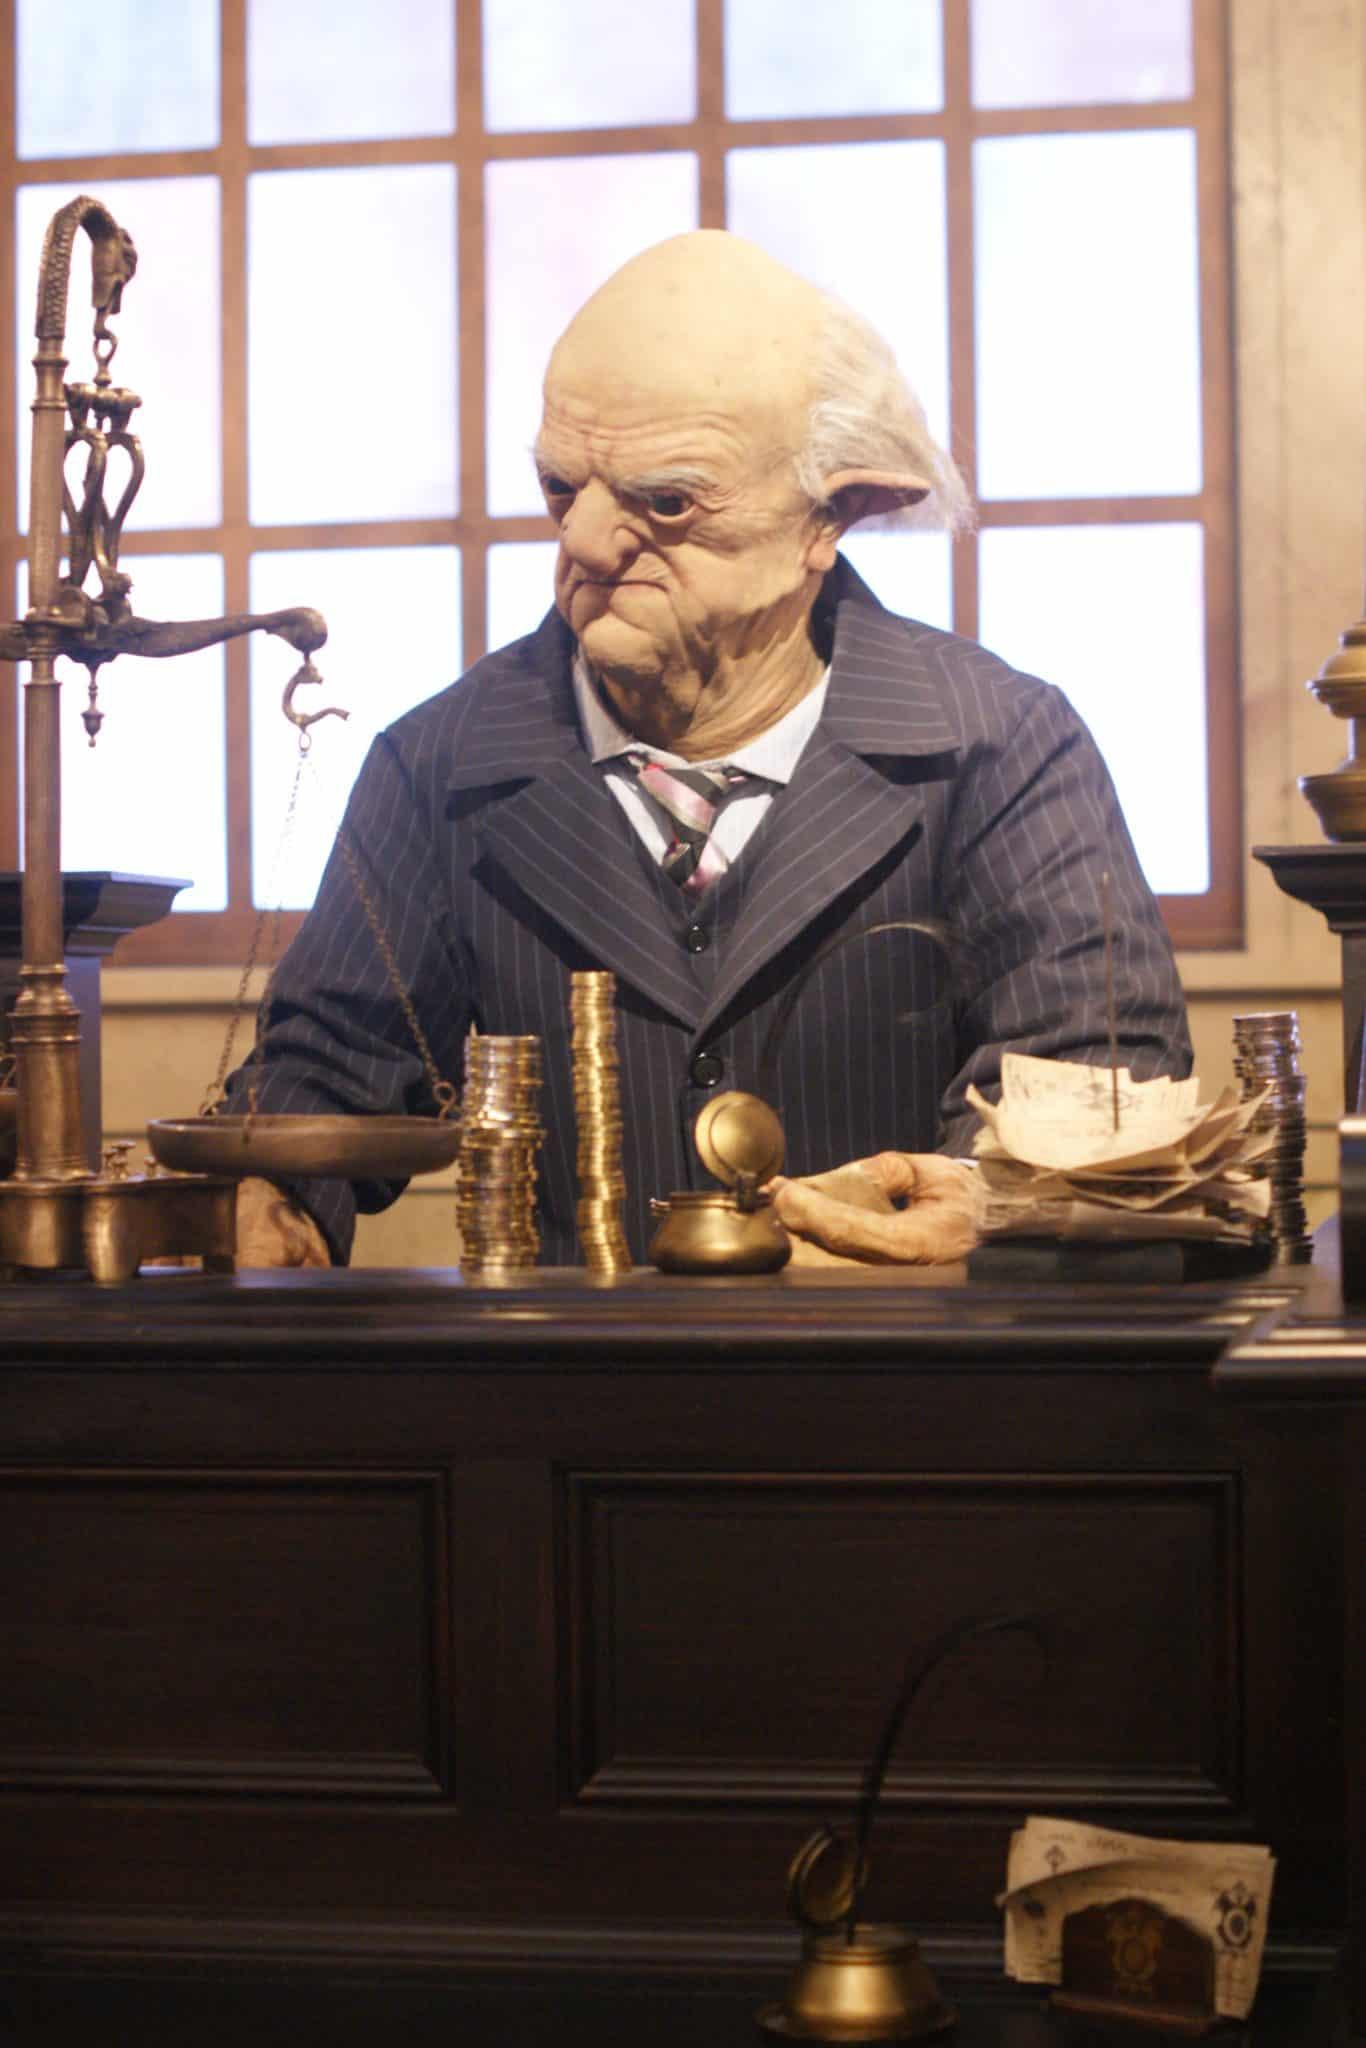 Diagon Alley Goblin in Gringotts Bank